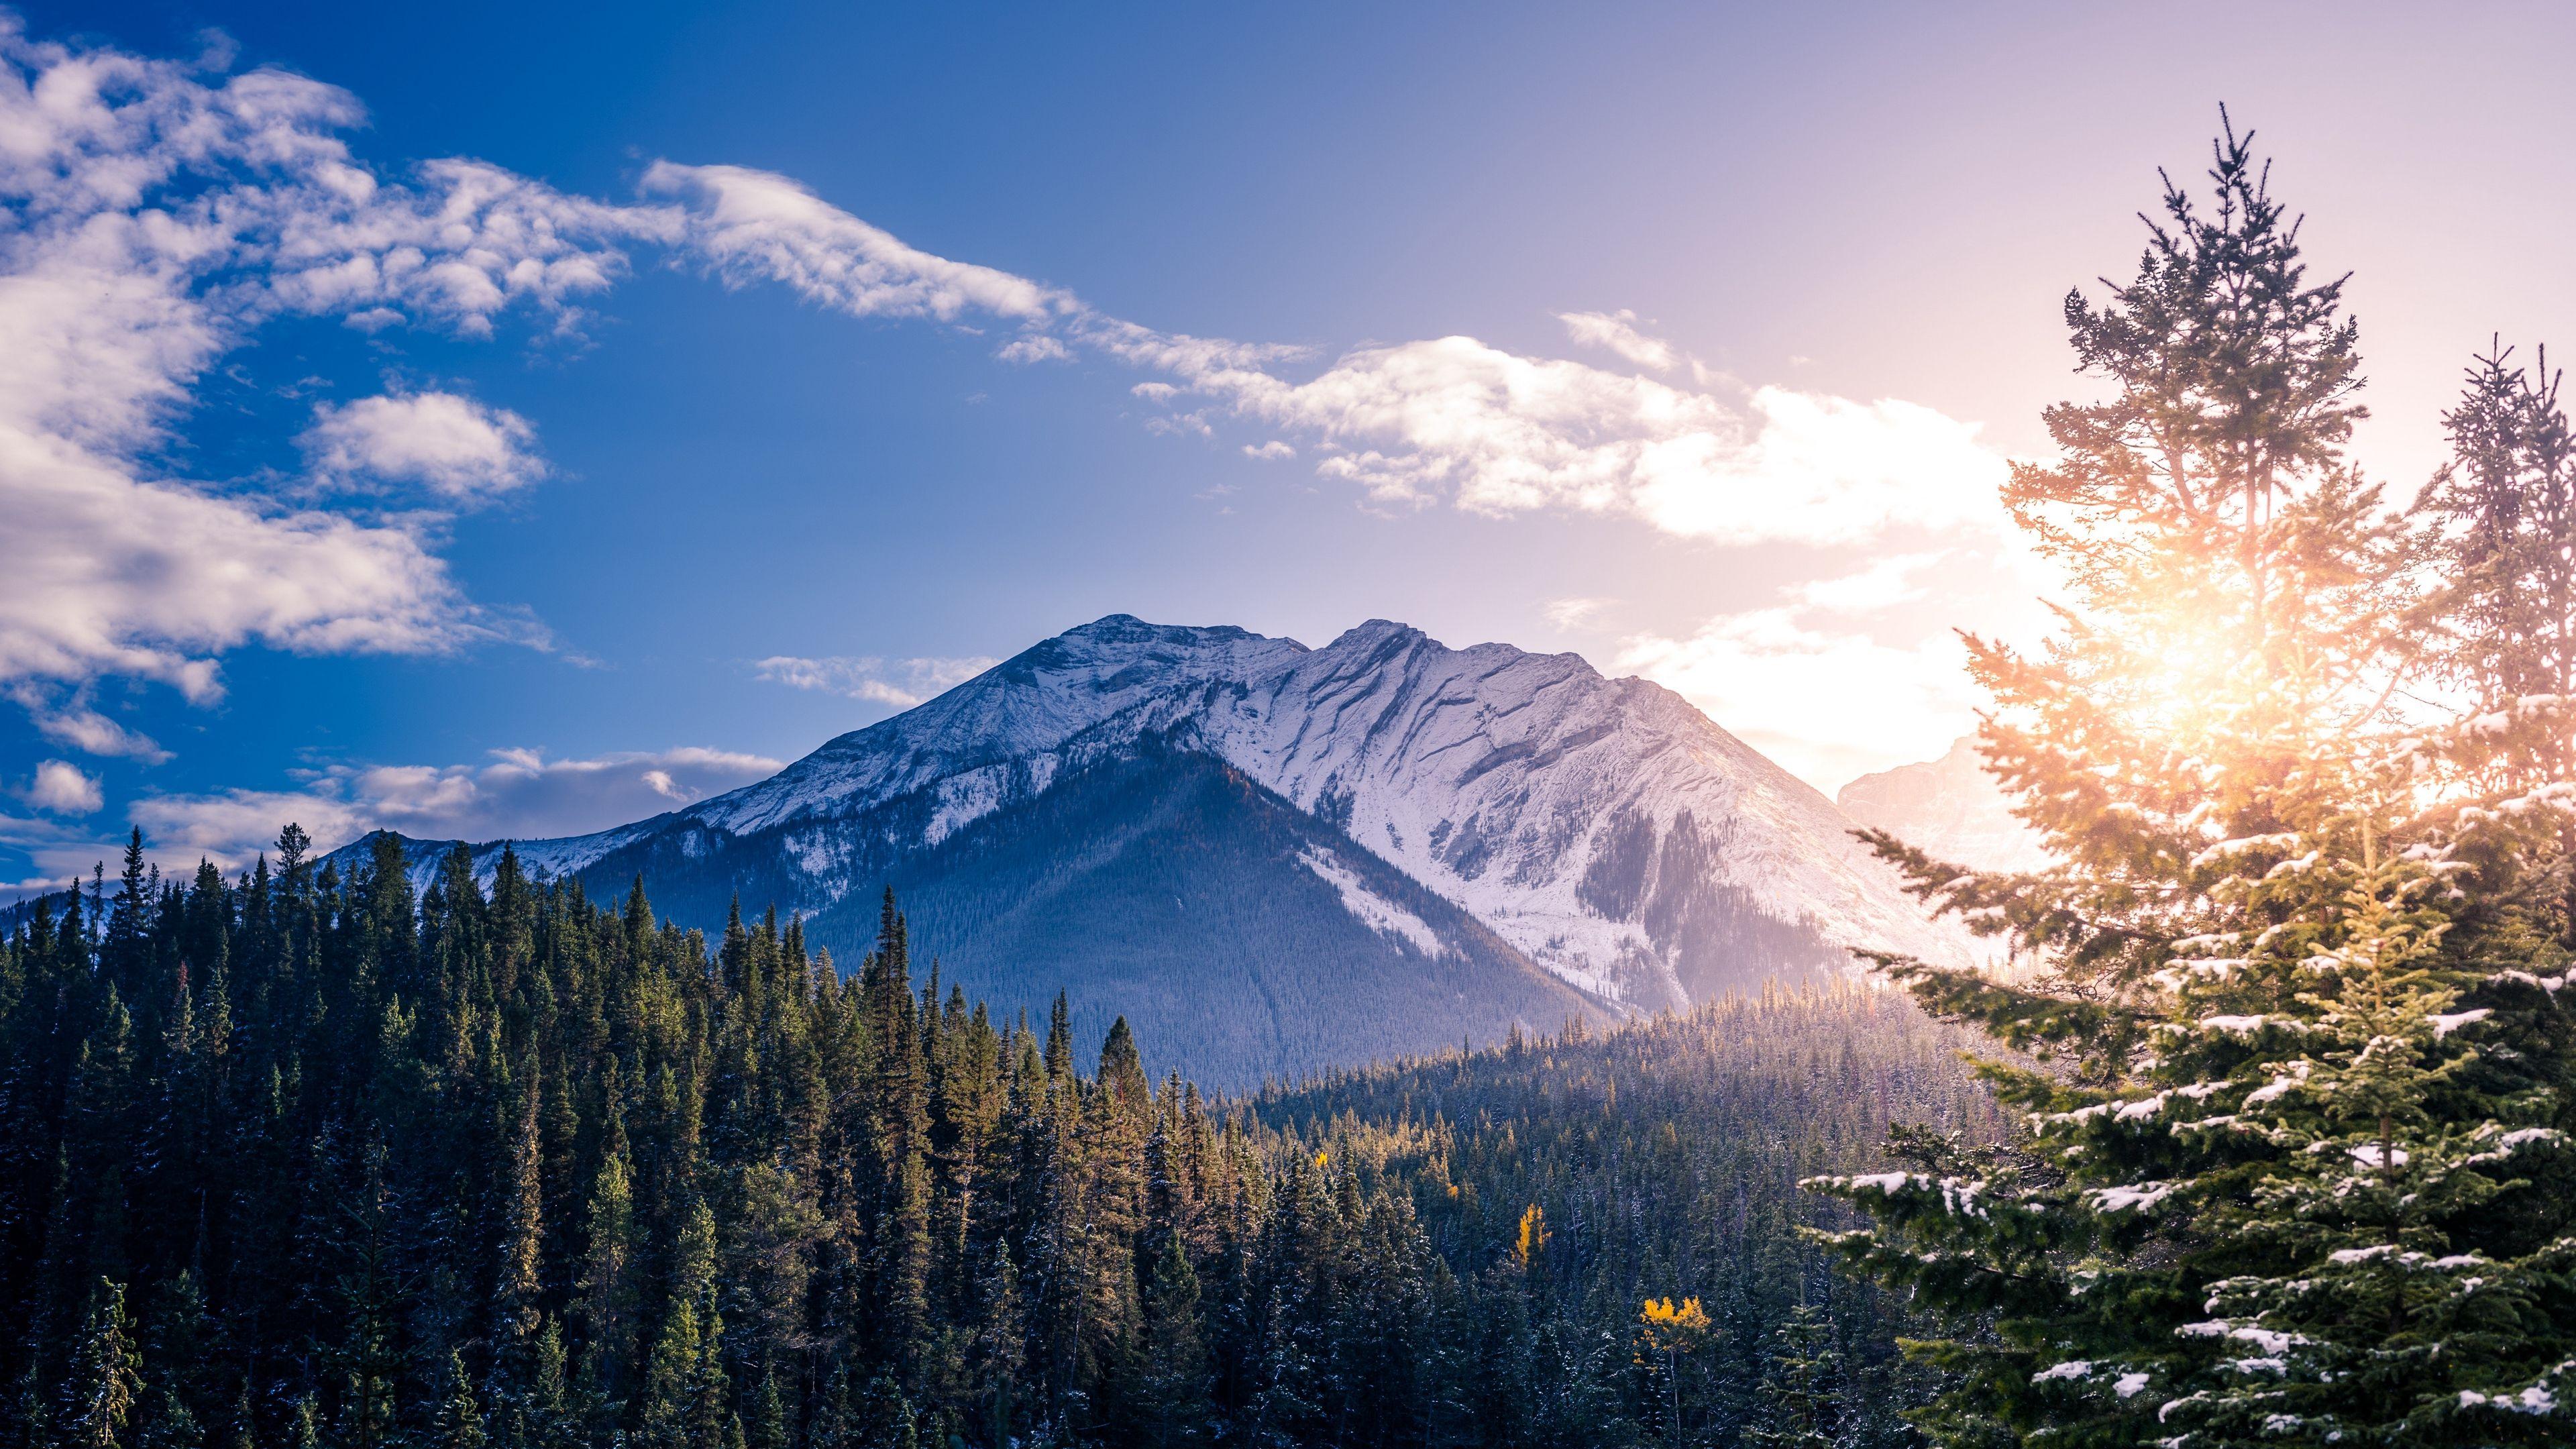 Download Wallpaper 3840x2160 Banff Canada Mountains Peaks Snow Covered 4k Uhd 16 9 Hd Background Landscape Wallpaper Banff National Park Banff